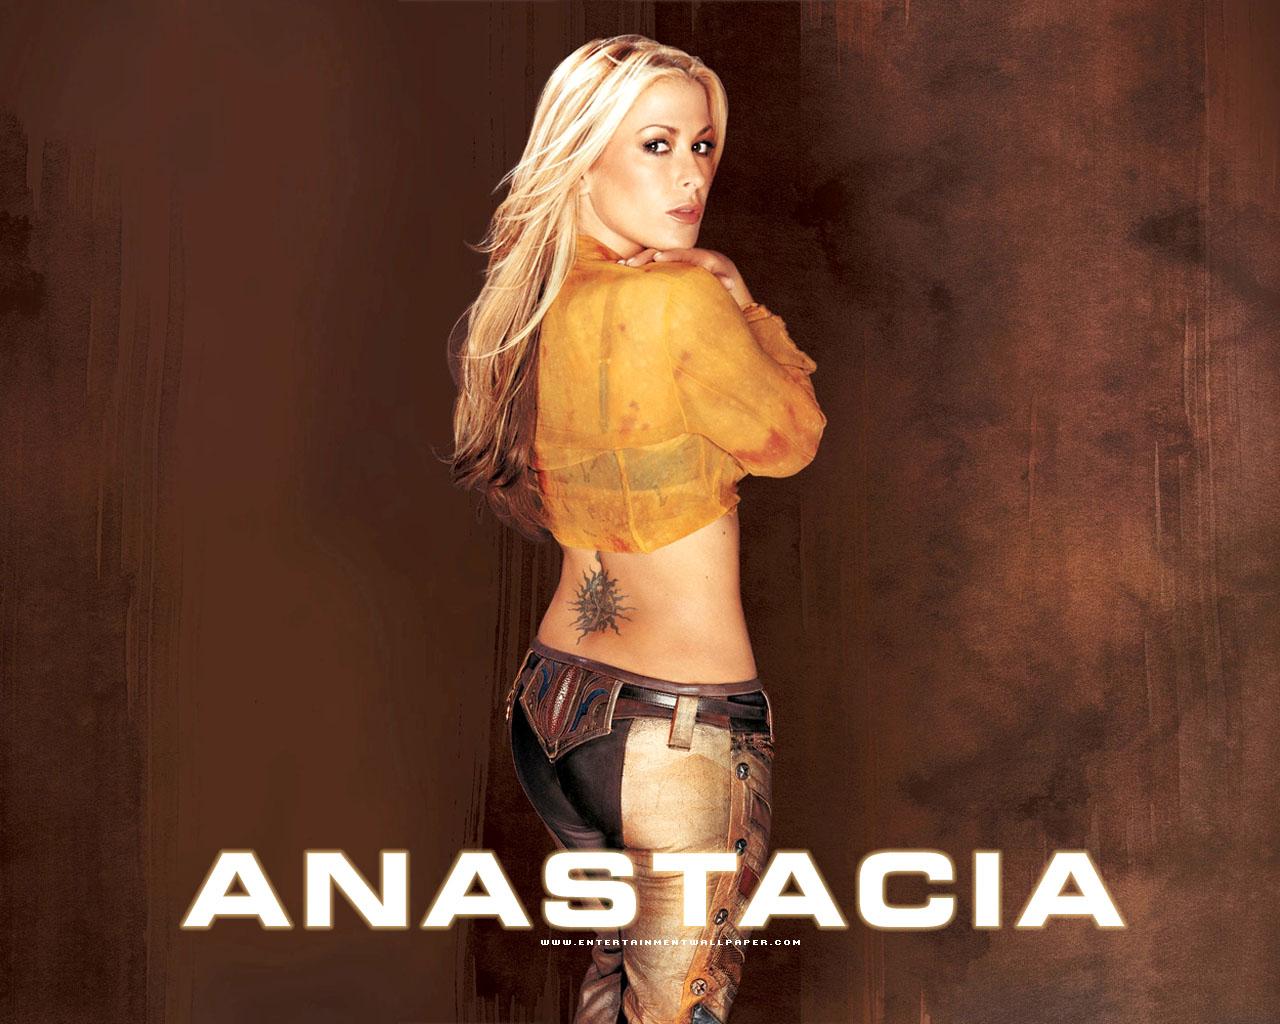 http://2.bp.blogspot.com/-ij_qmSTu9L0/UUEVt8652yI/AAAAAAAA24I/4eEmX1C6CCA/s1600/Anastacia-Wallpapers+-butt.jpg